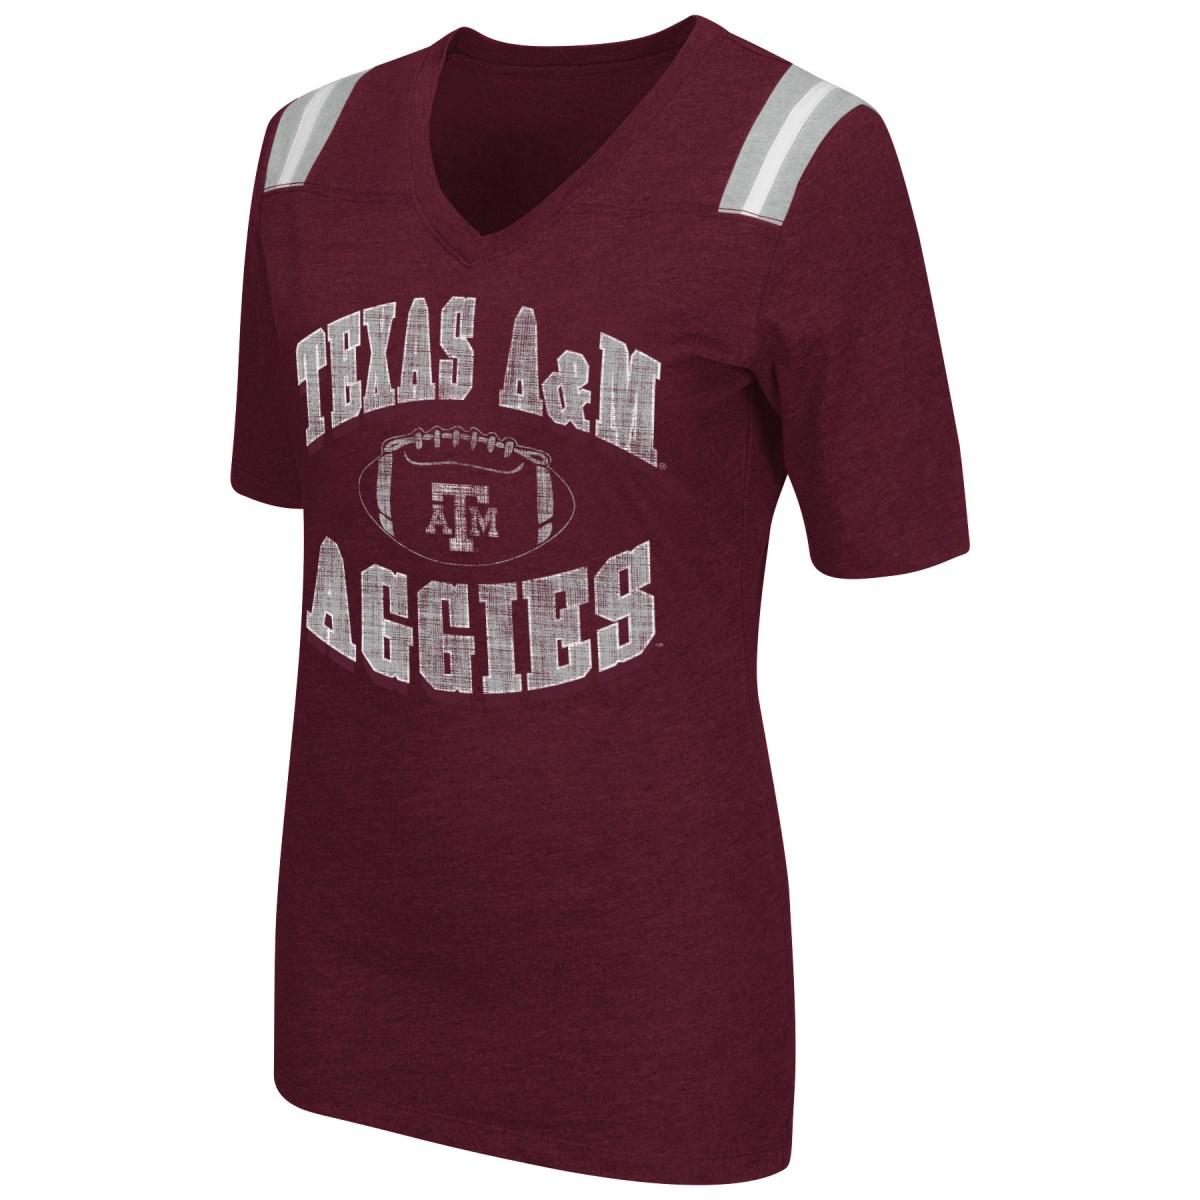 "Texas A&M Aggies Women's NCAA ""Artistic"" Dual Blend Short Sleeve T-Shirt"